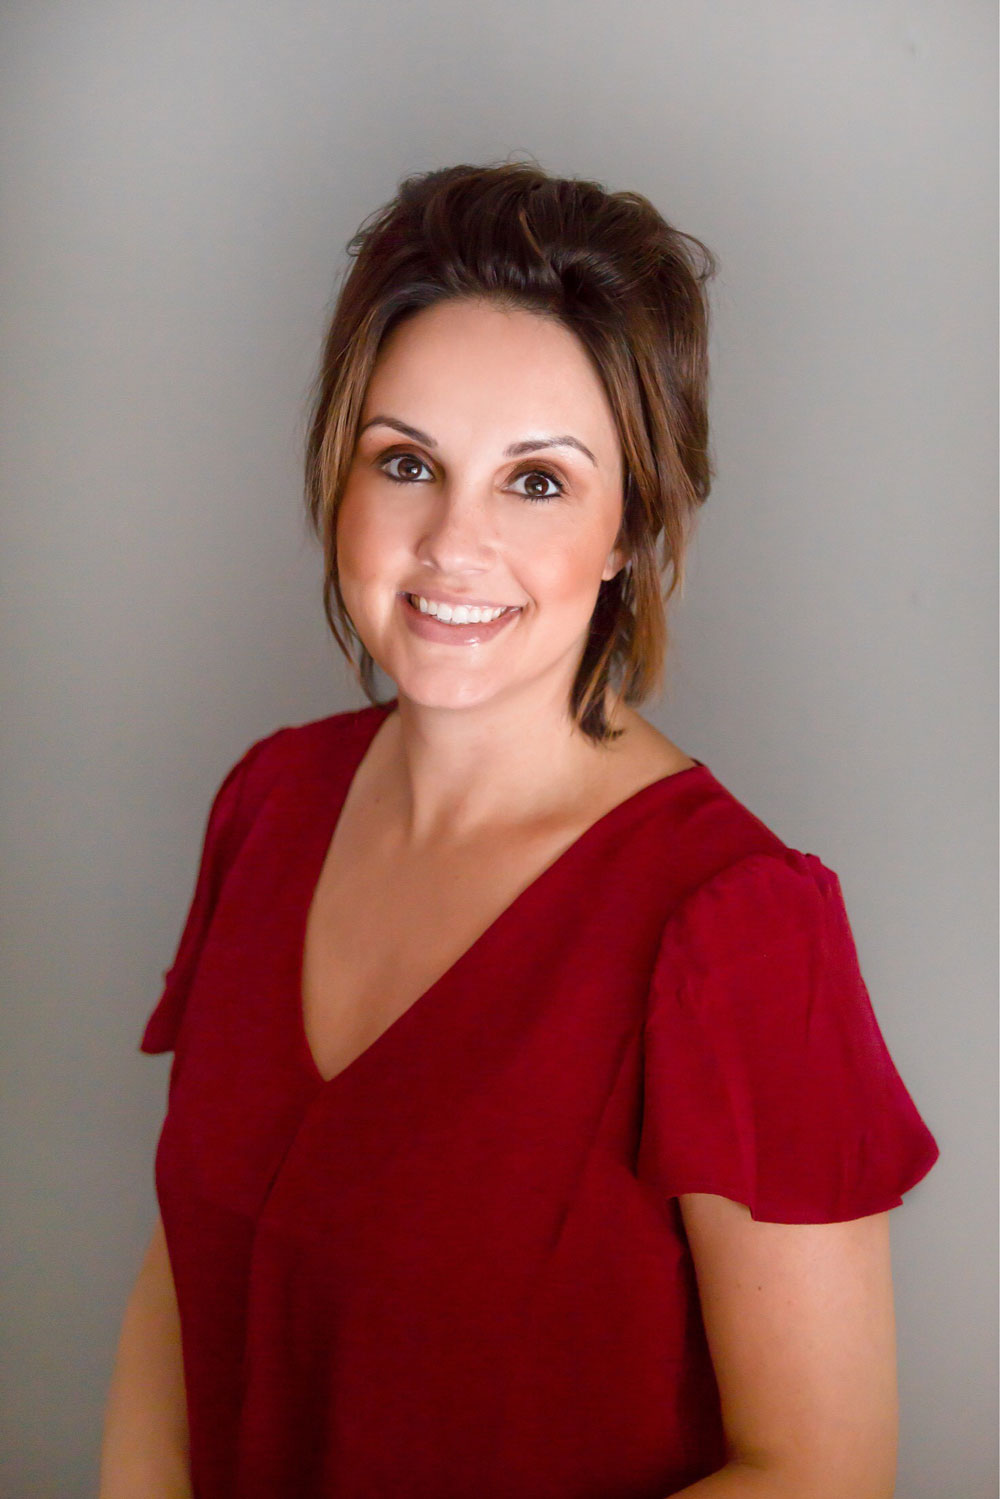 Rachel Koth